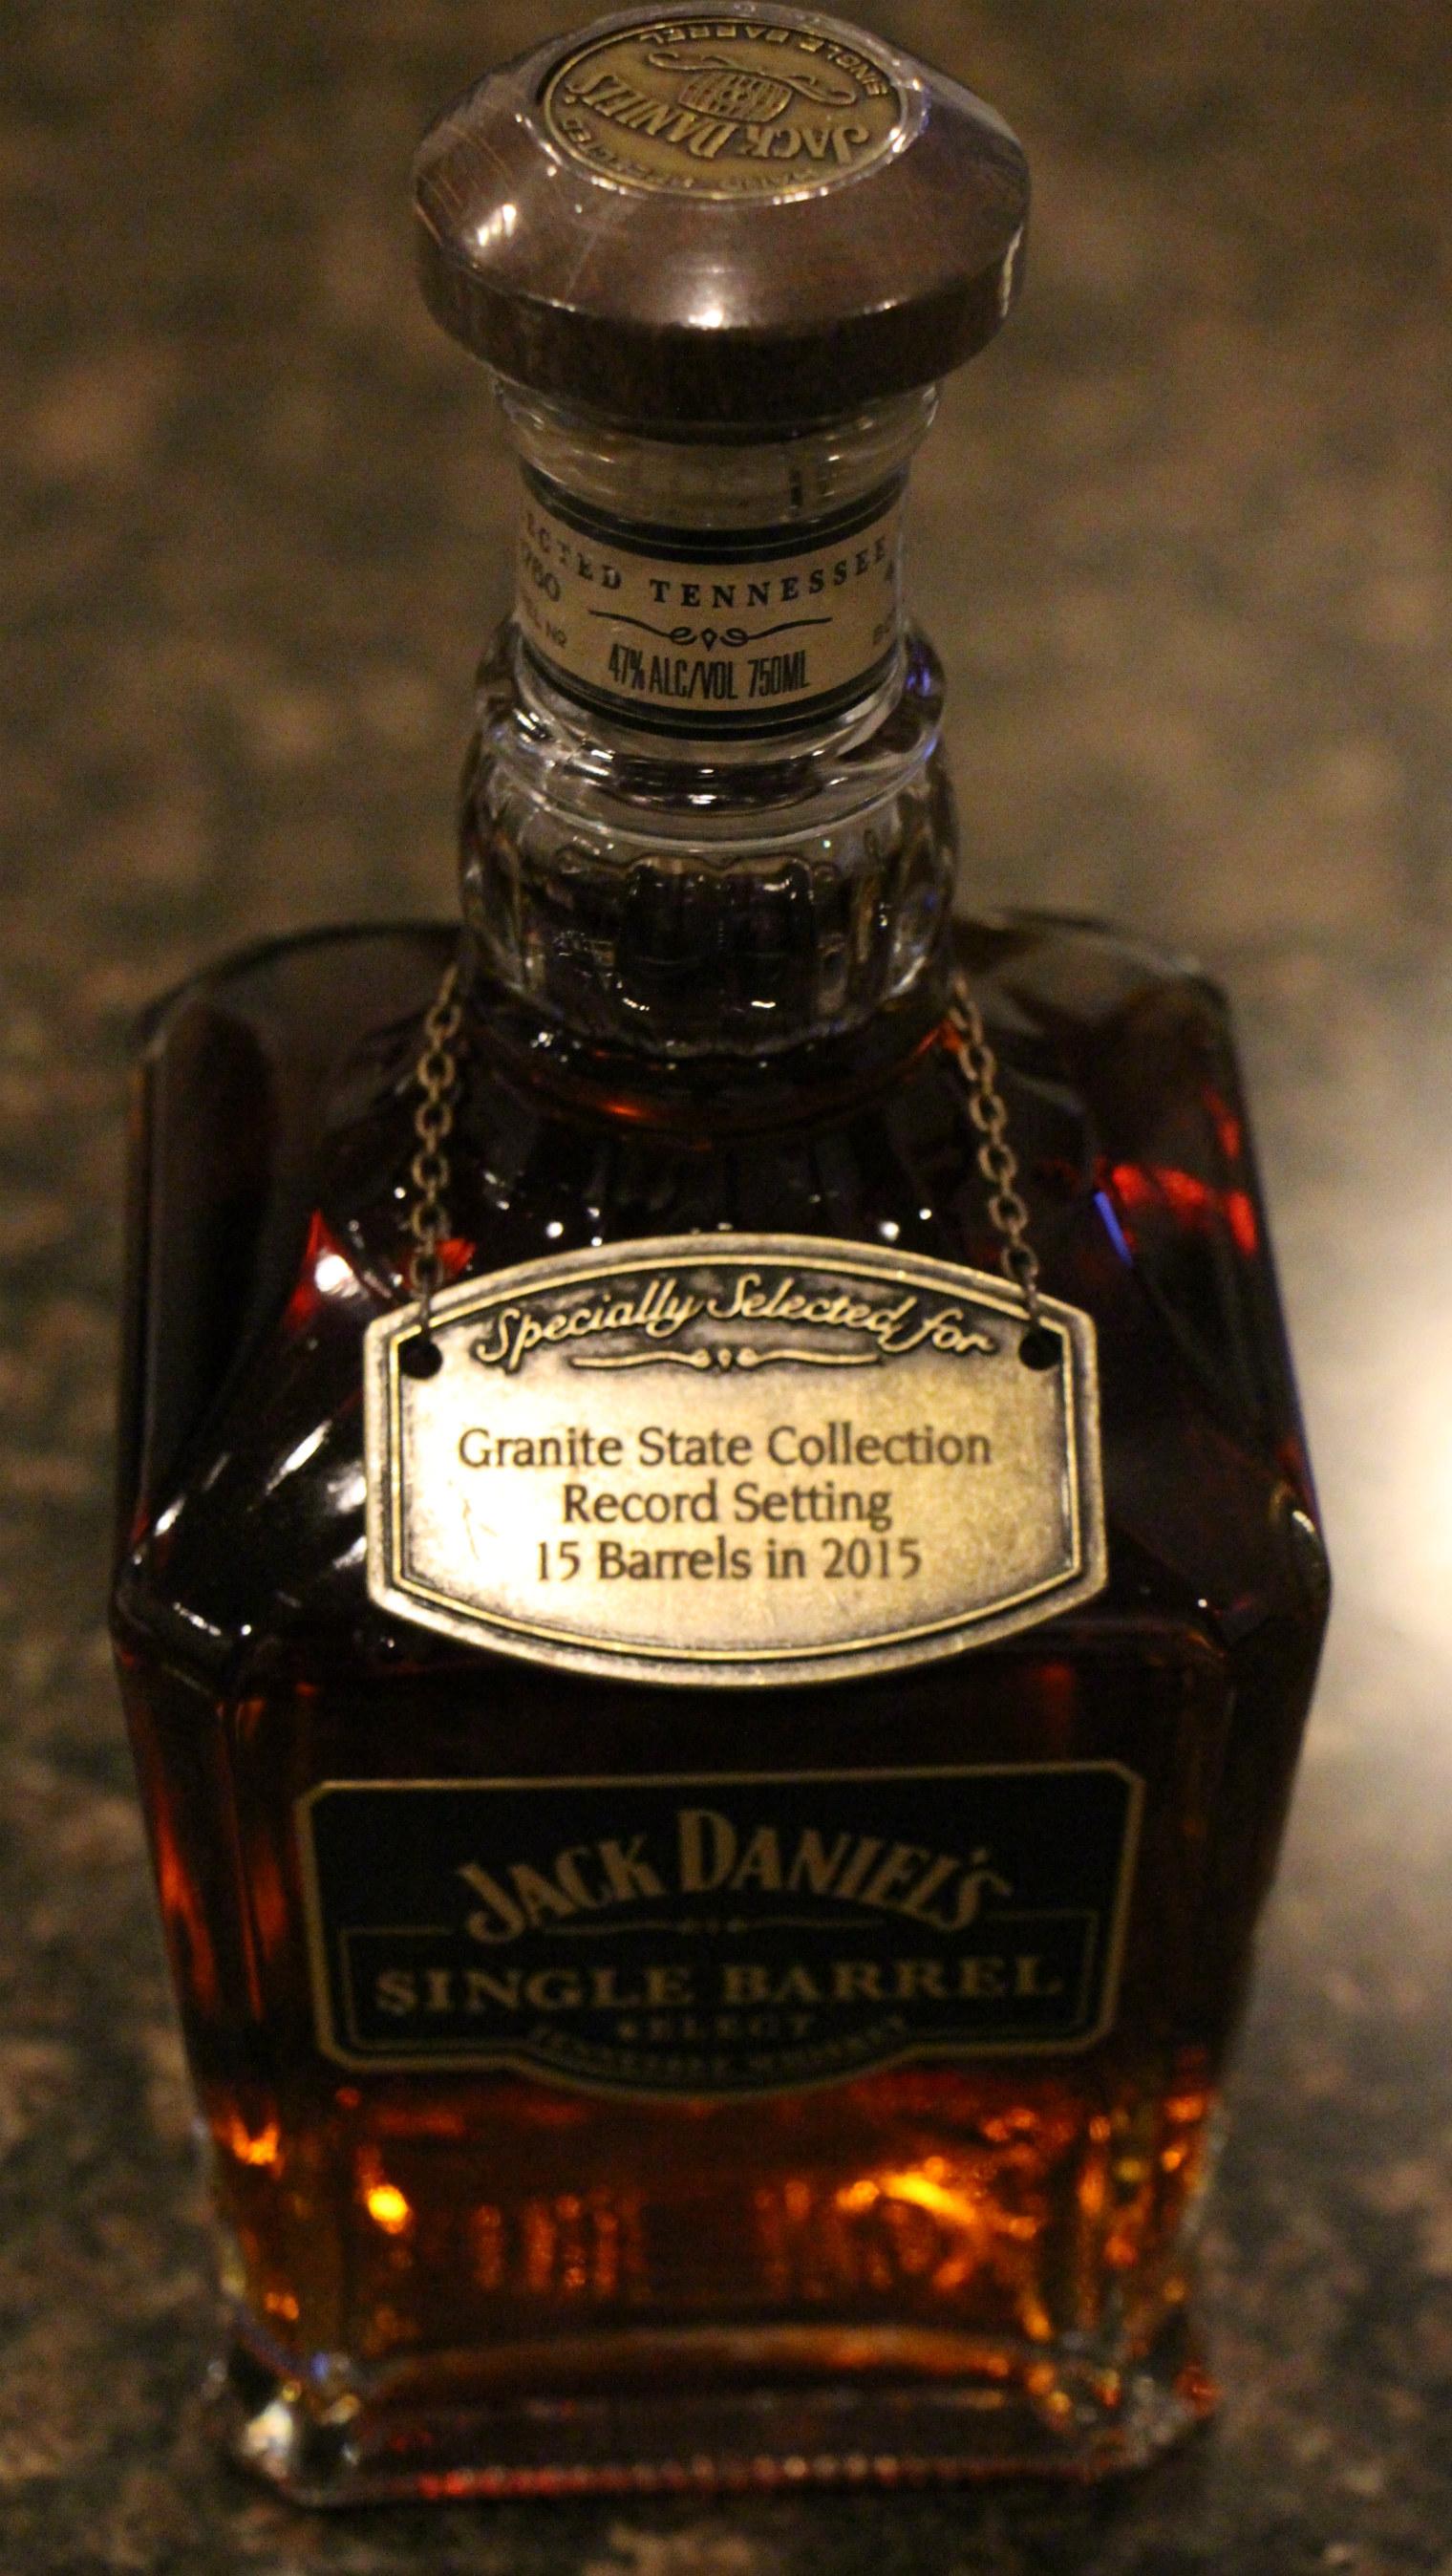 Jack Daniel's Single Barrel Select Granite State Collection Rick R-6 Barrel 15-1778